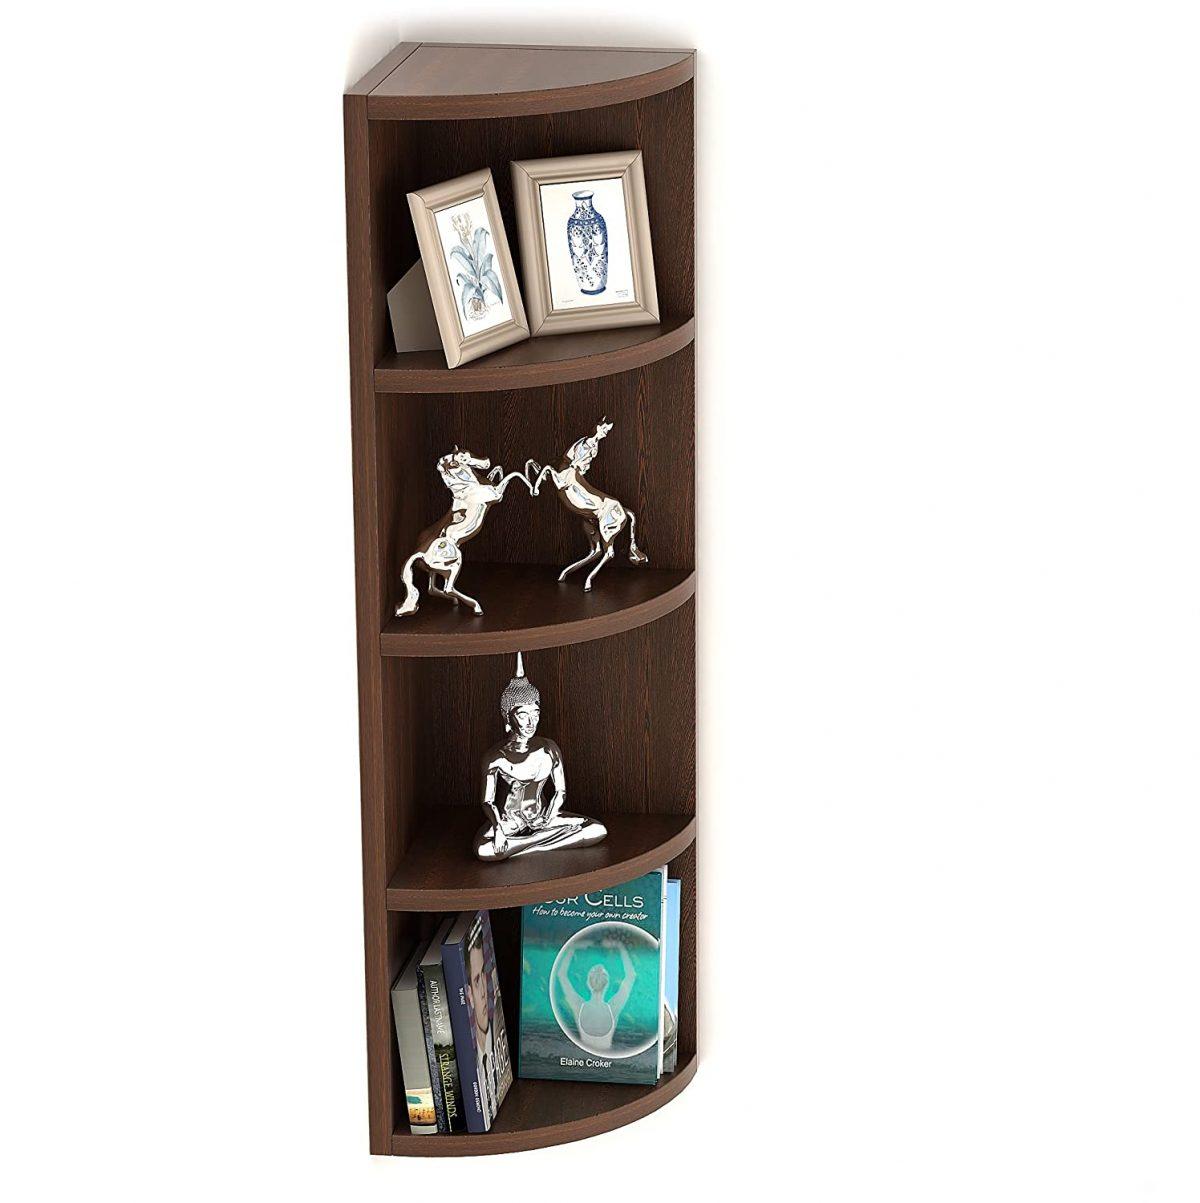 Tier Corner Wall Decor Shelf/Display Rack (5 Shelves)